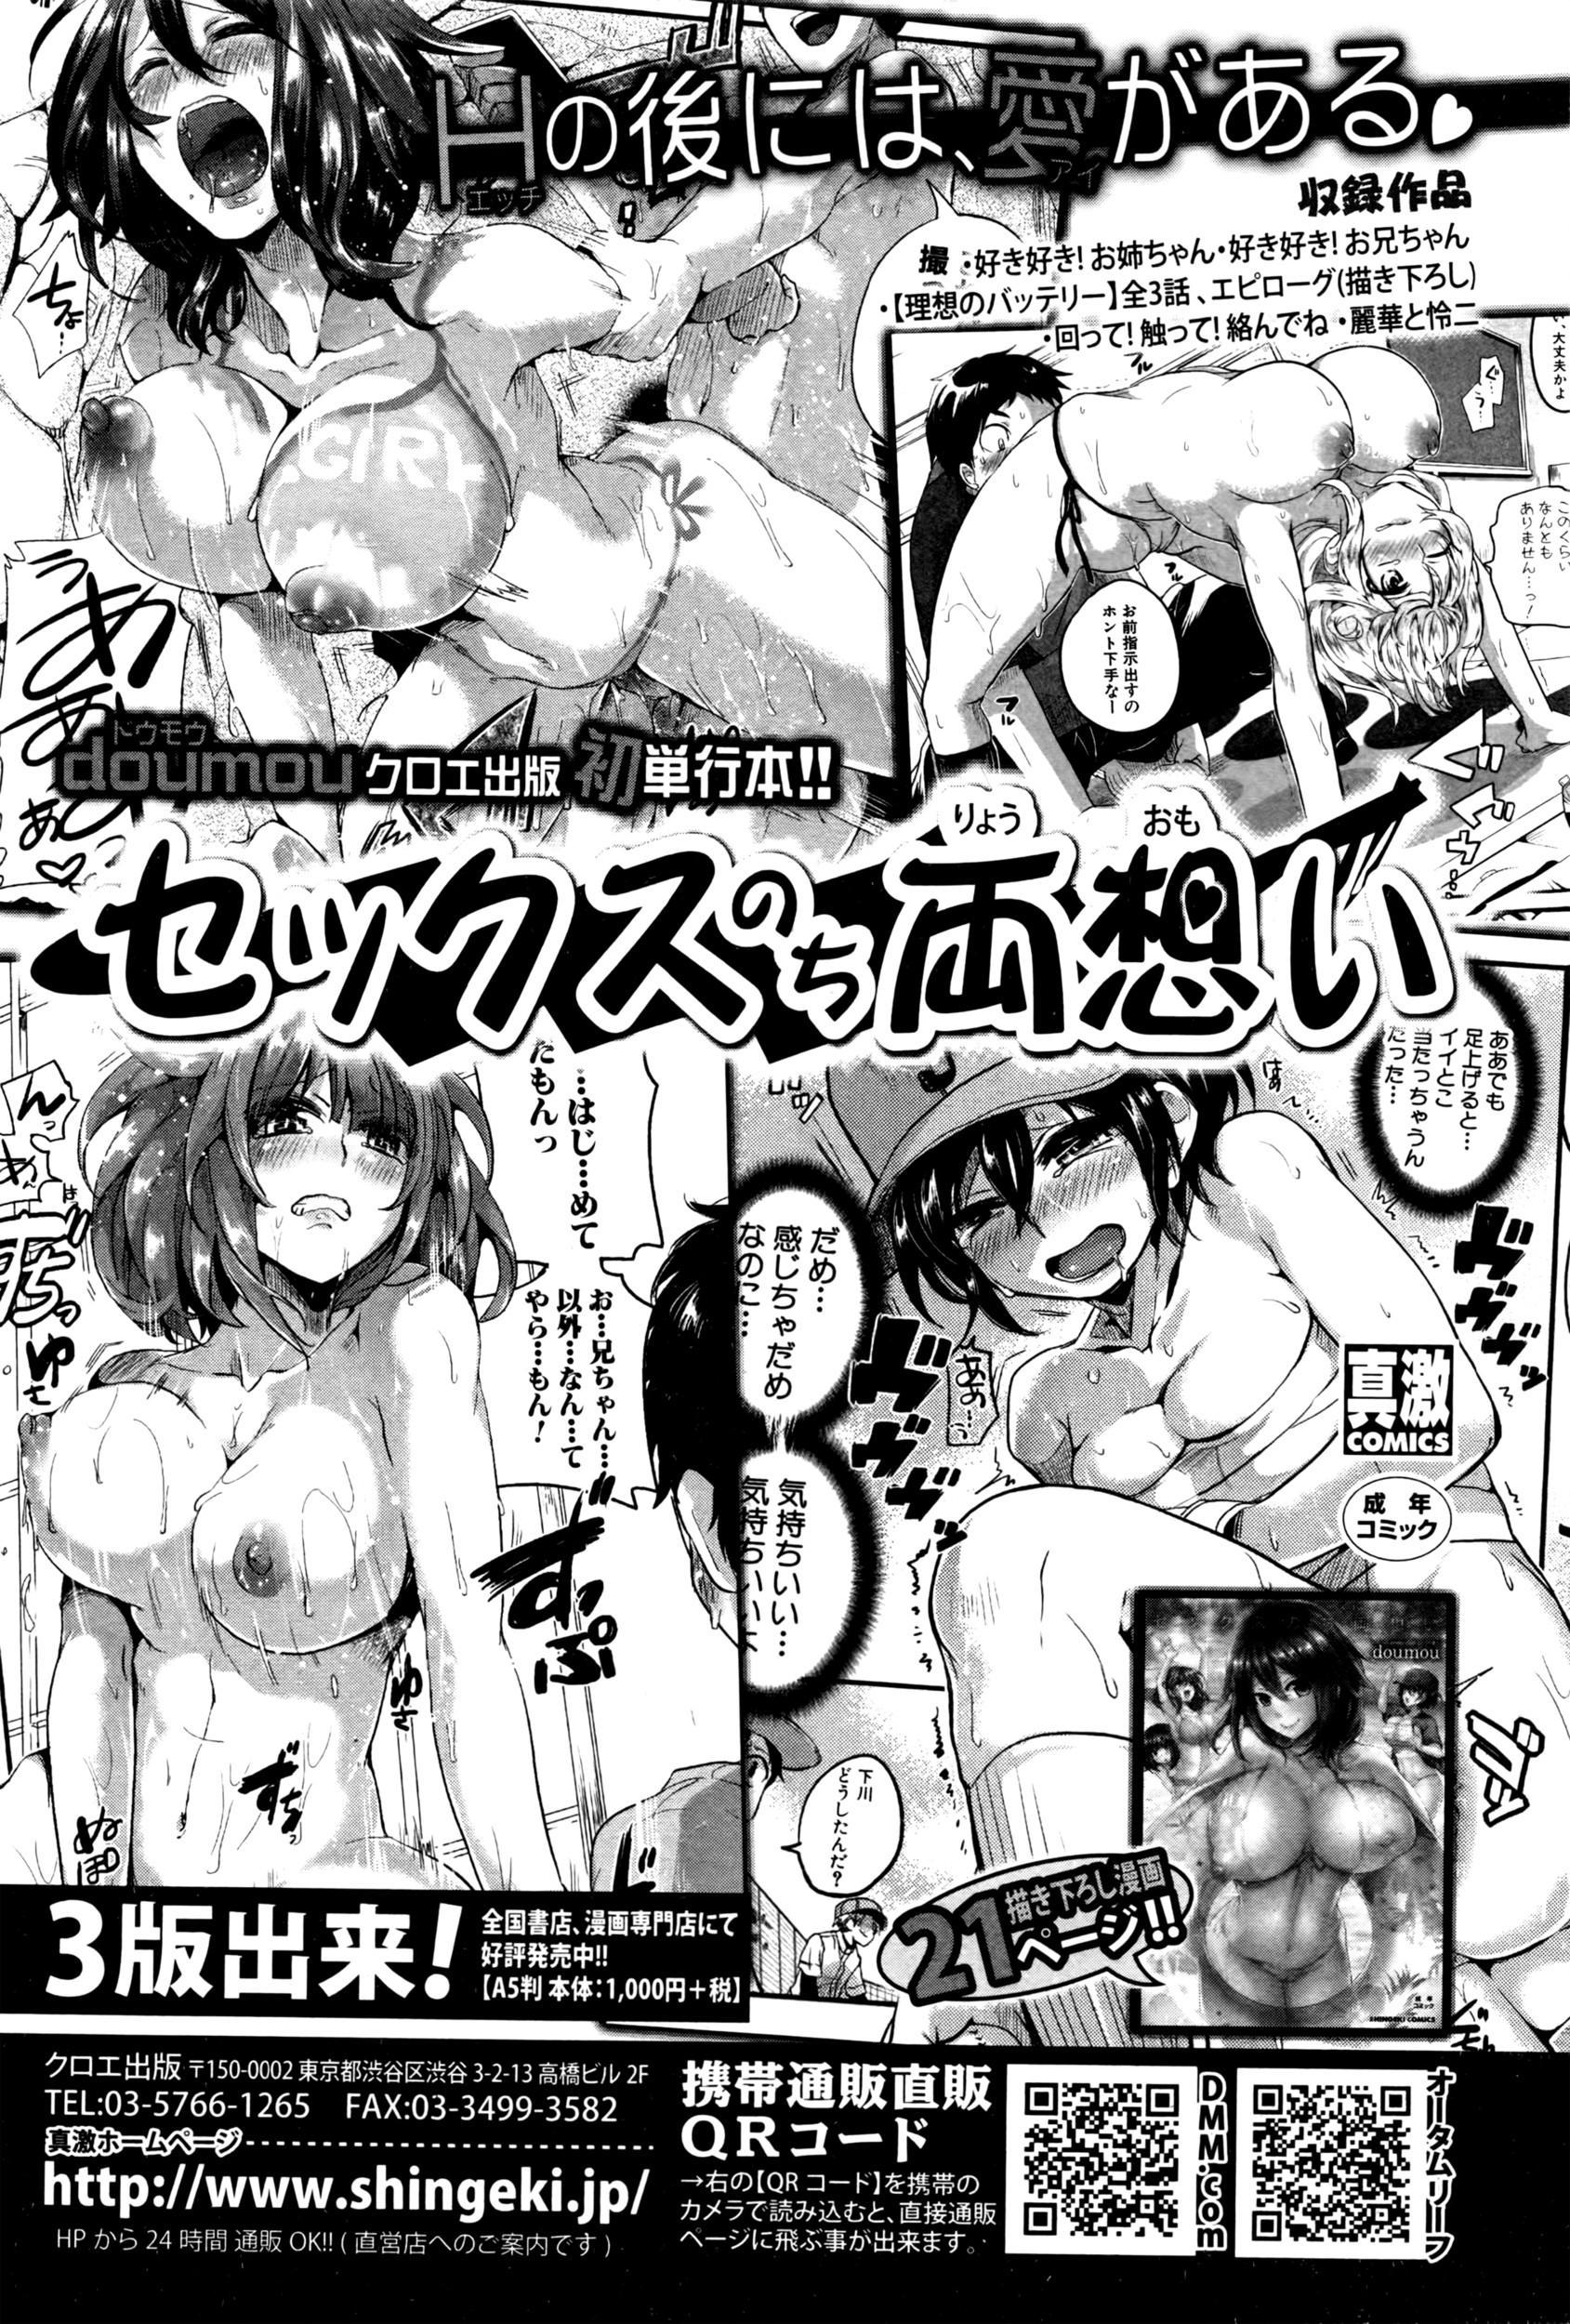 COMIC Shingeki 2016-04 90